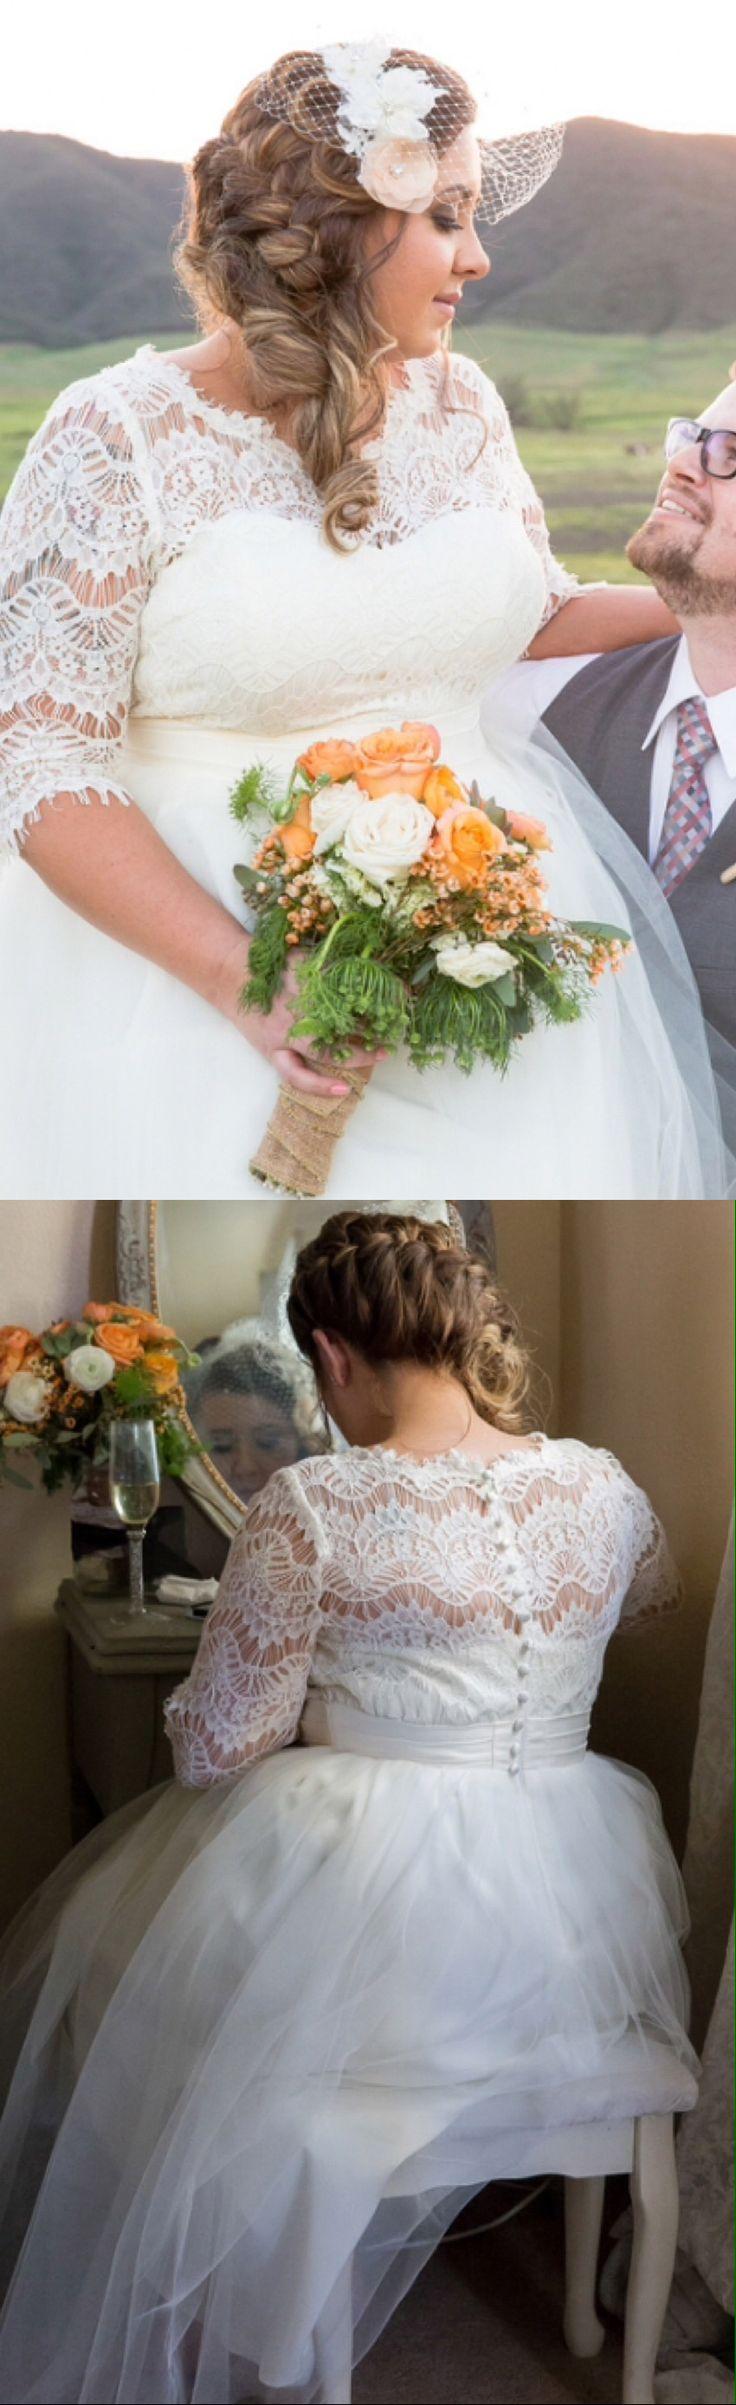 #plus size wedding dresses #wedding dresses 2016 #lace wedding dresses #2016 wedding dresses #2016 wedding dresses #bridal wedding dresses